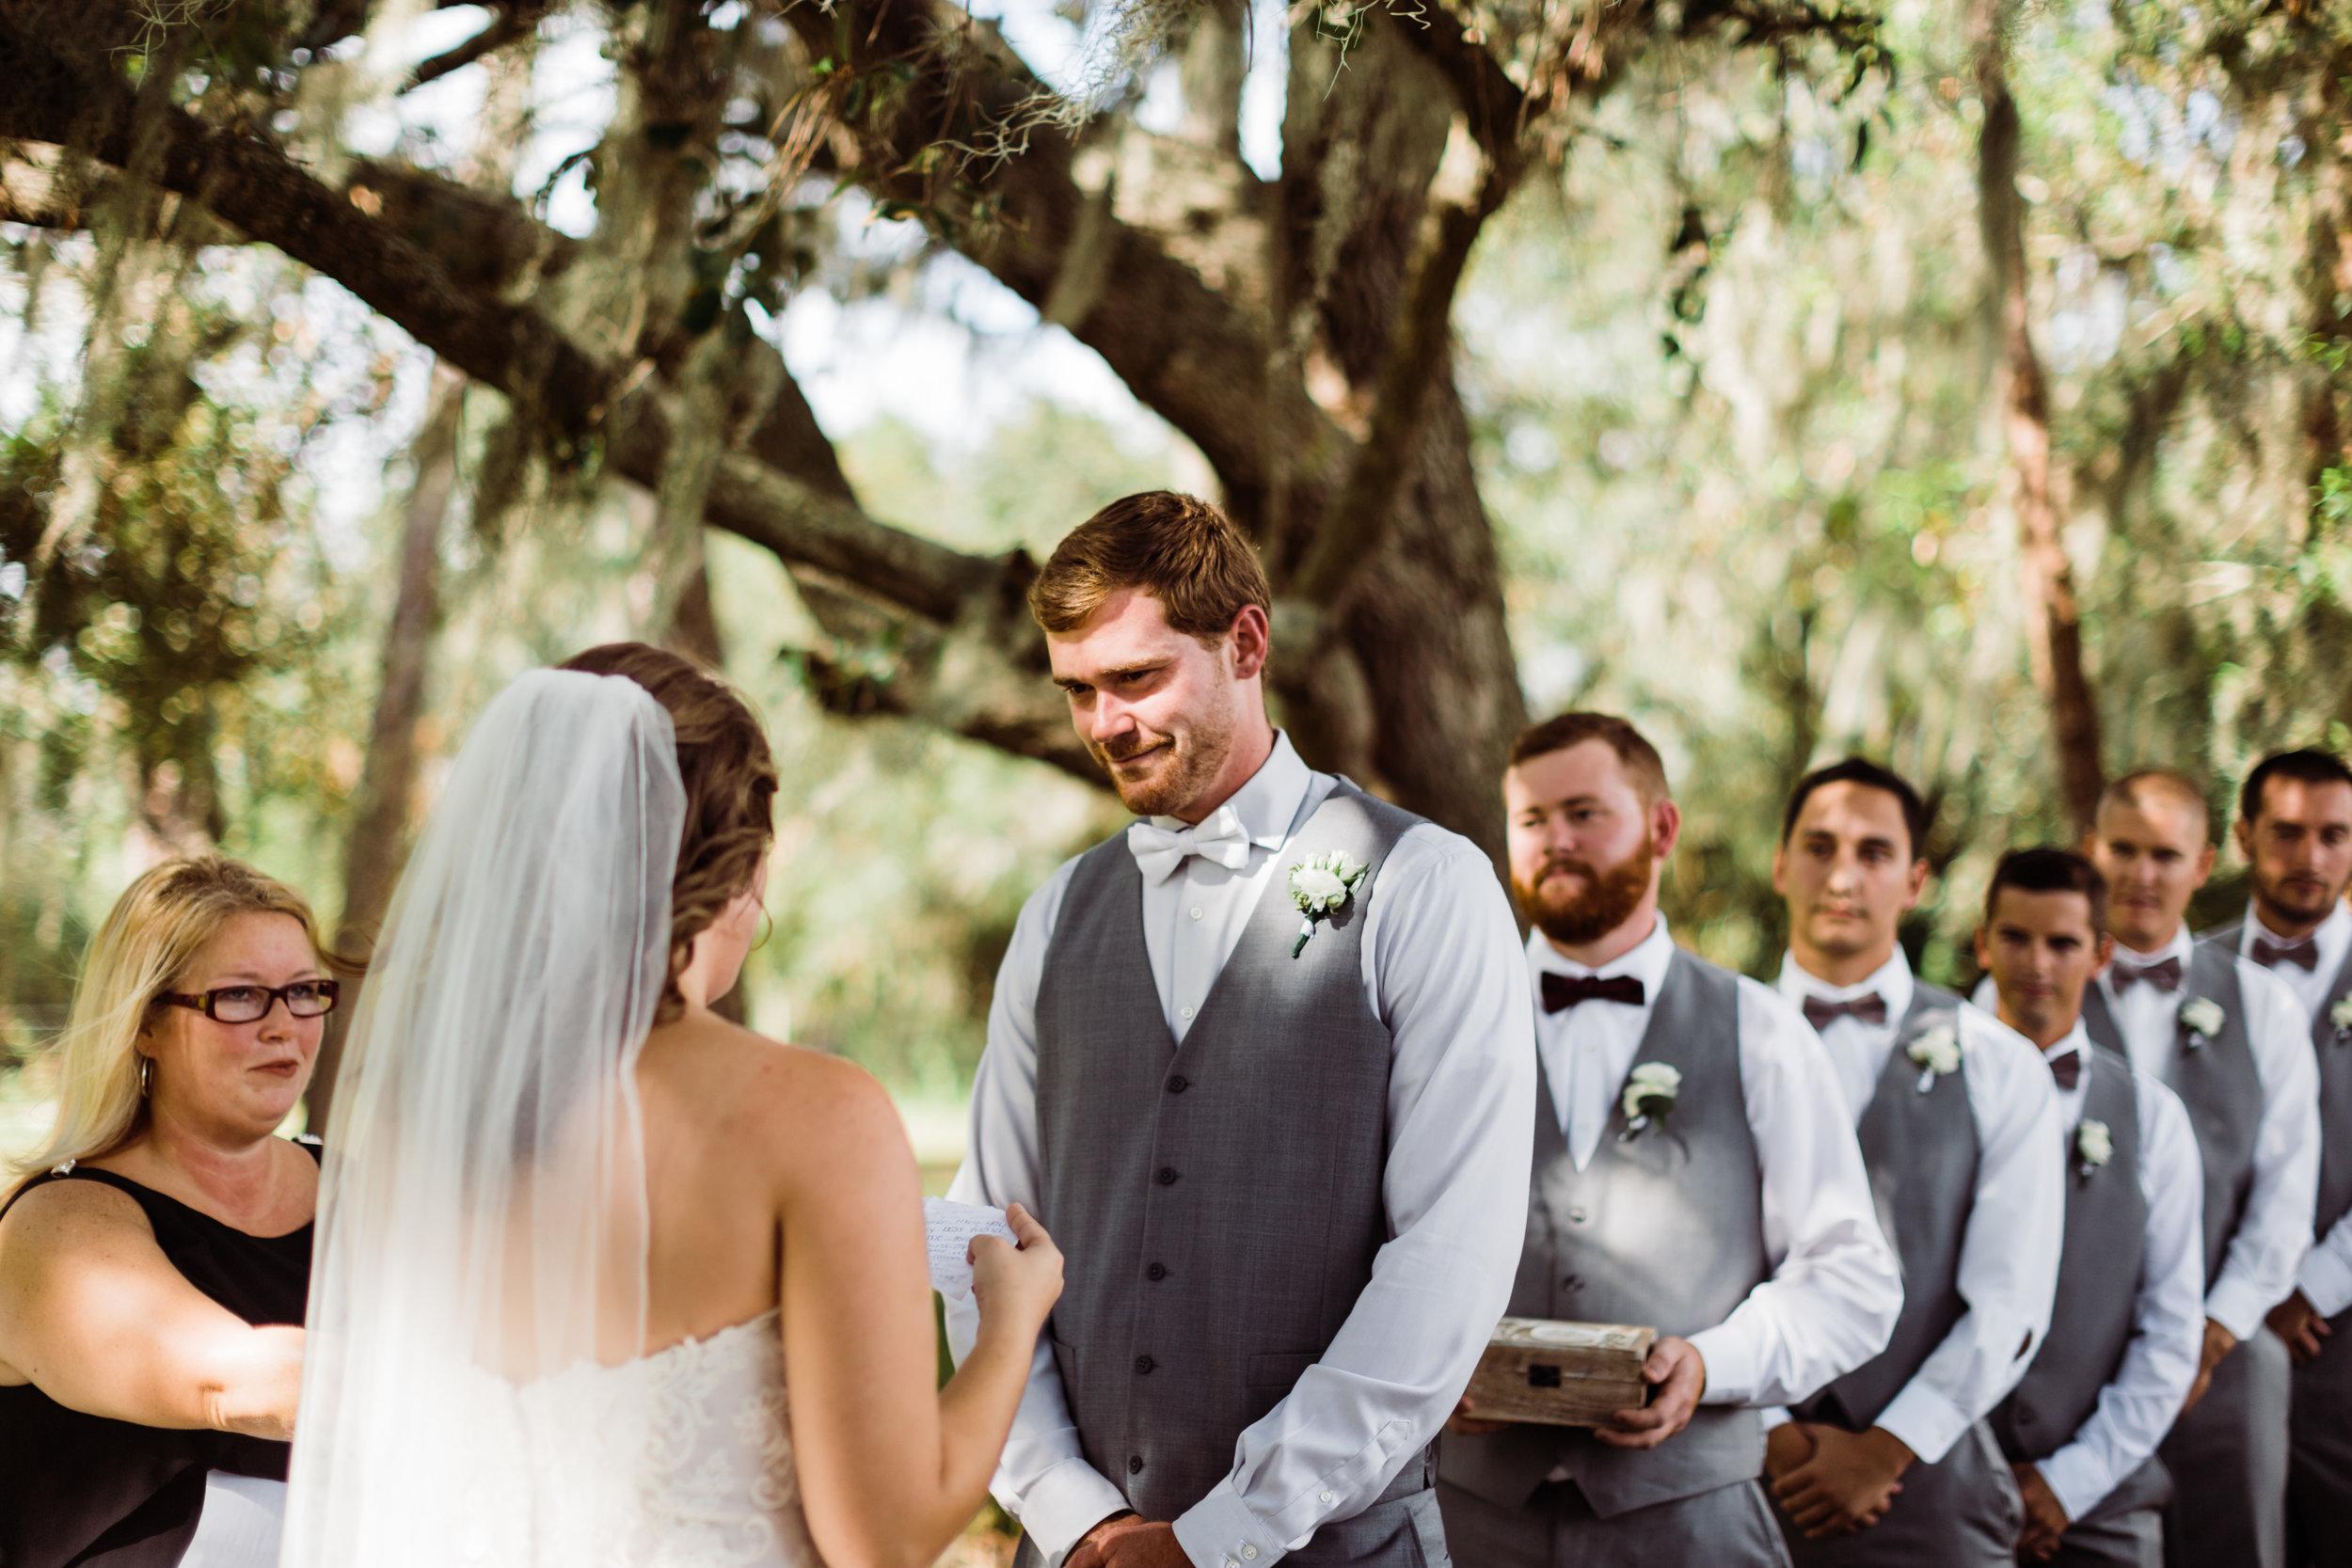 2017.10.14 Samantha and Matthew Crabtree Sarasota Wedding (154 of 708).jpg